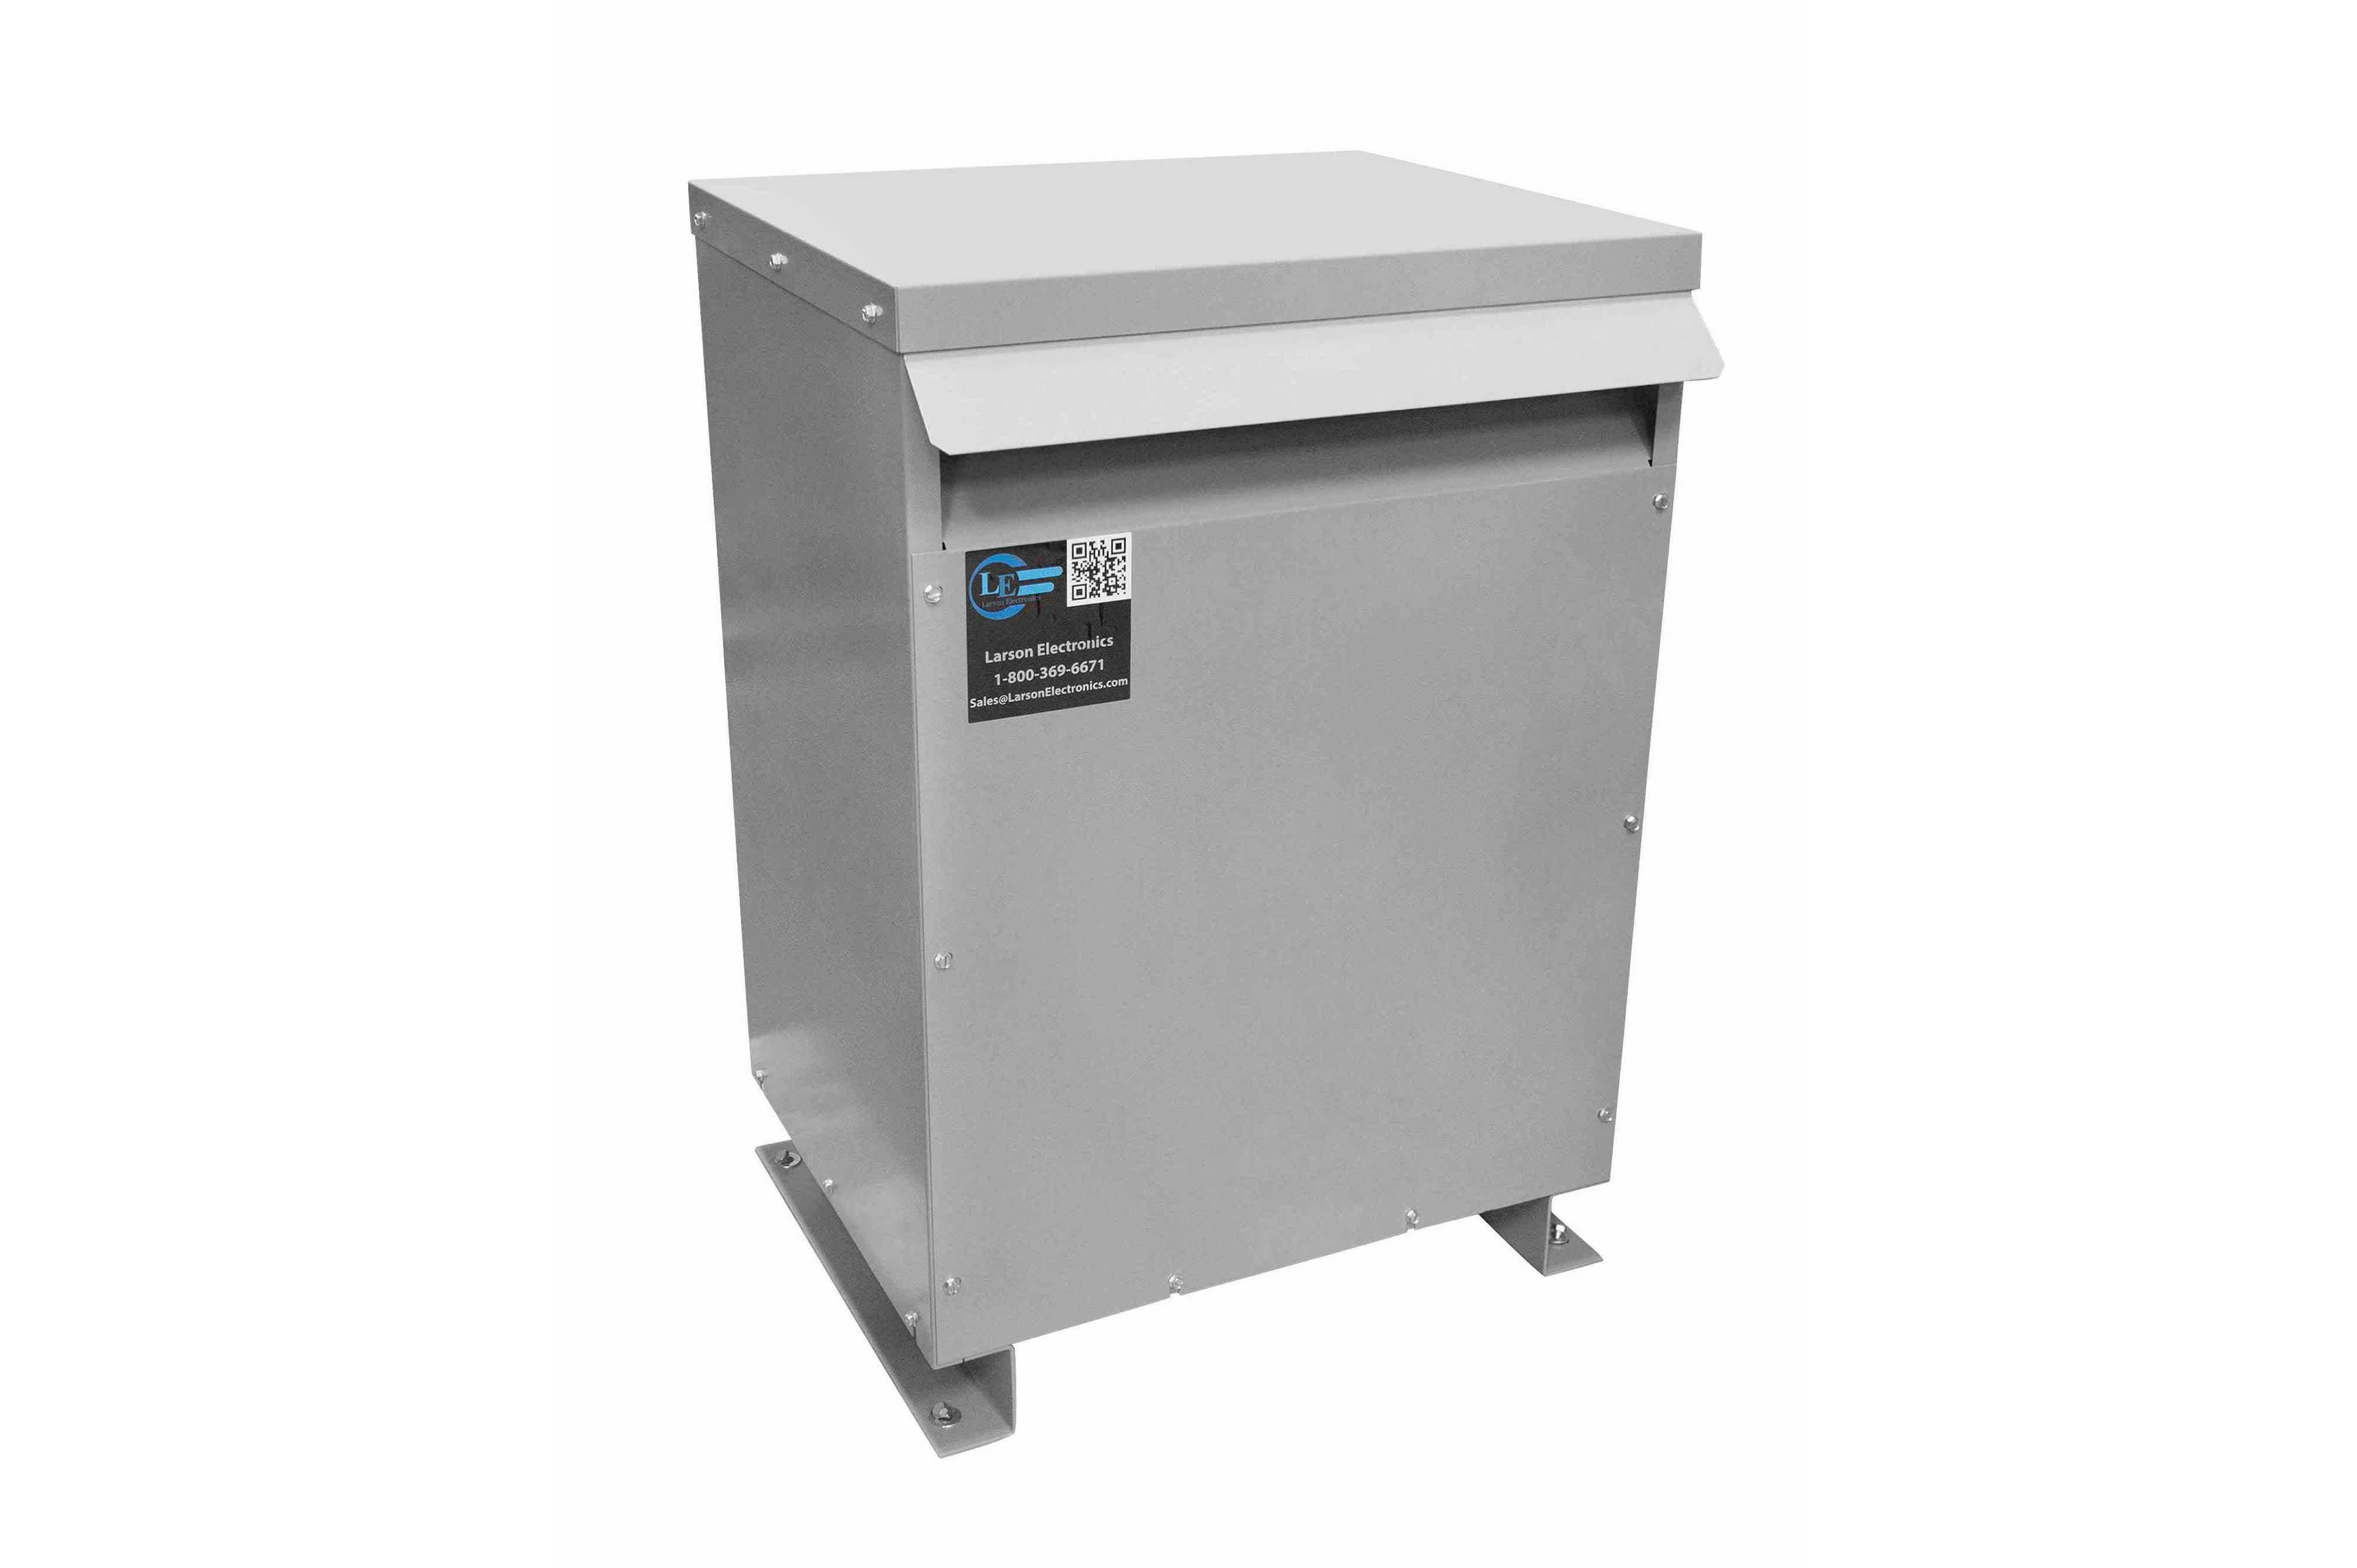 29 kVA 3PH Isolation Transformer, 208V Wye Primary, 240V/120 Delta Secondary, N3R, Ventilated, 60 Hz